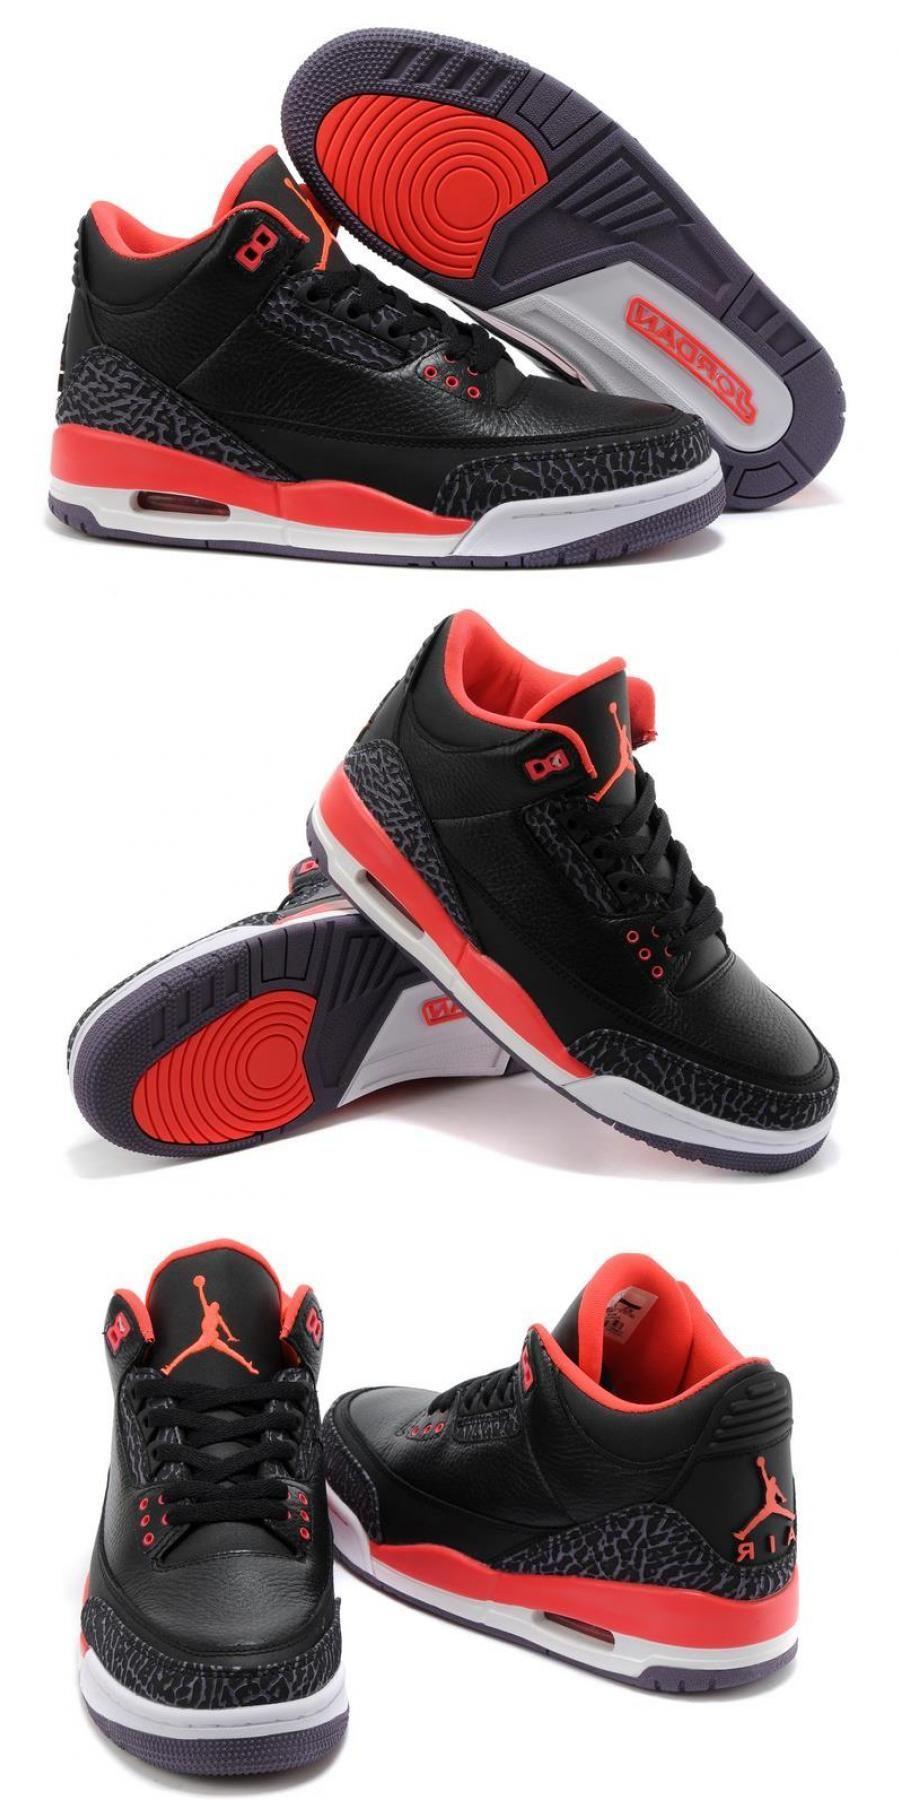 Air Jordan 3 Retro Black/bright Crimsoncanyon Purplepure